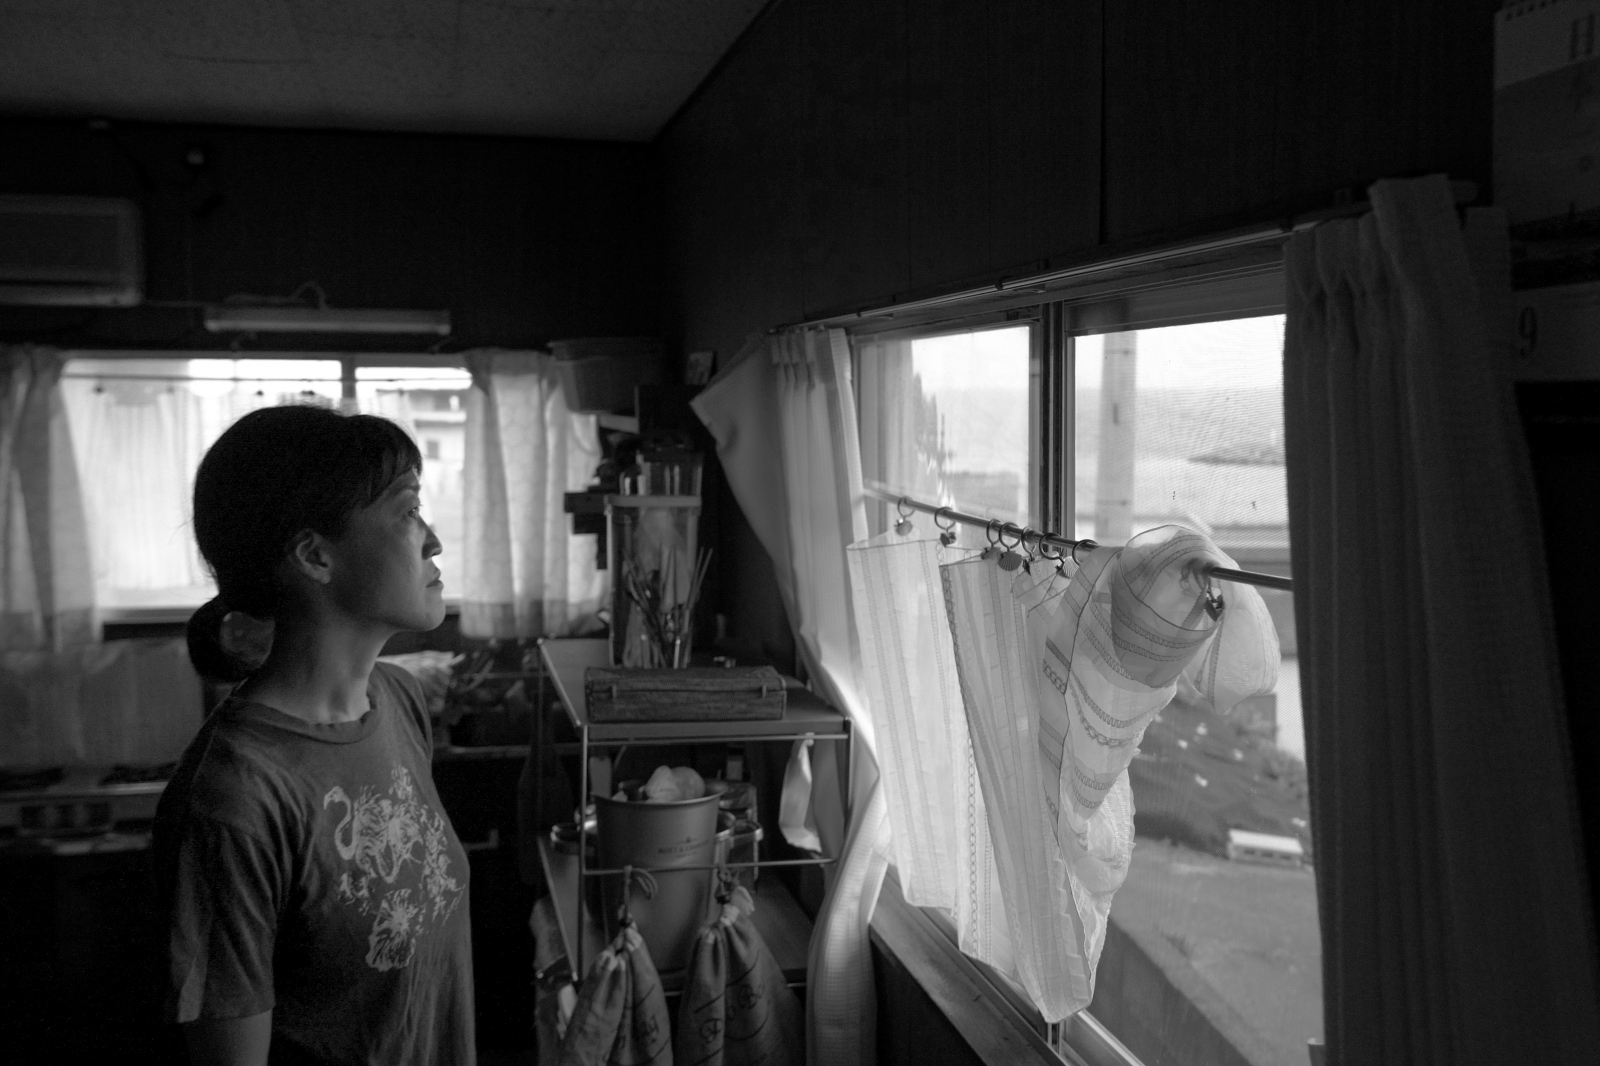 Ijikacho, Toba, Aiko Ohno, 37, inside her house in ijikacho, Toba, Mie prefecture, watching outside the window